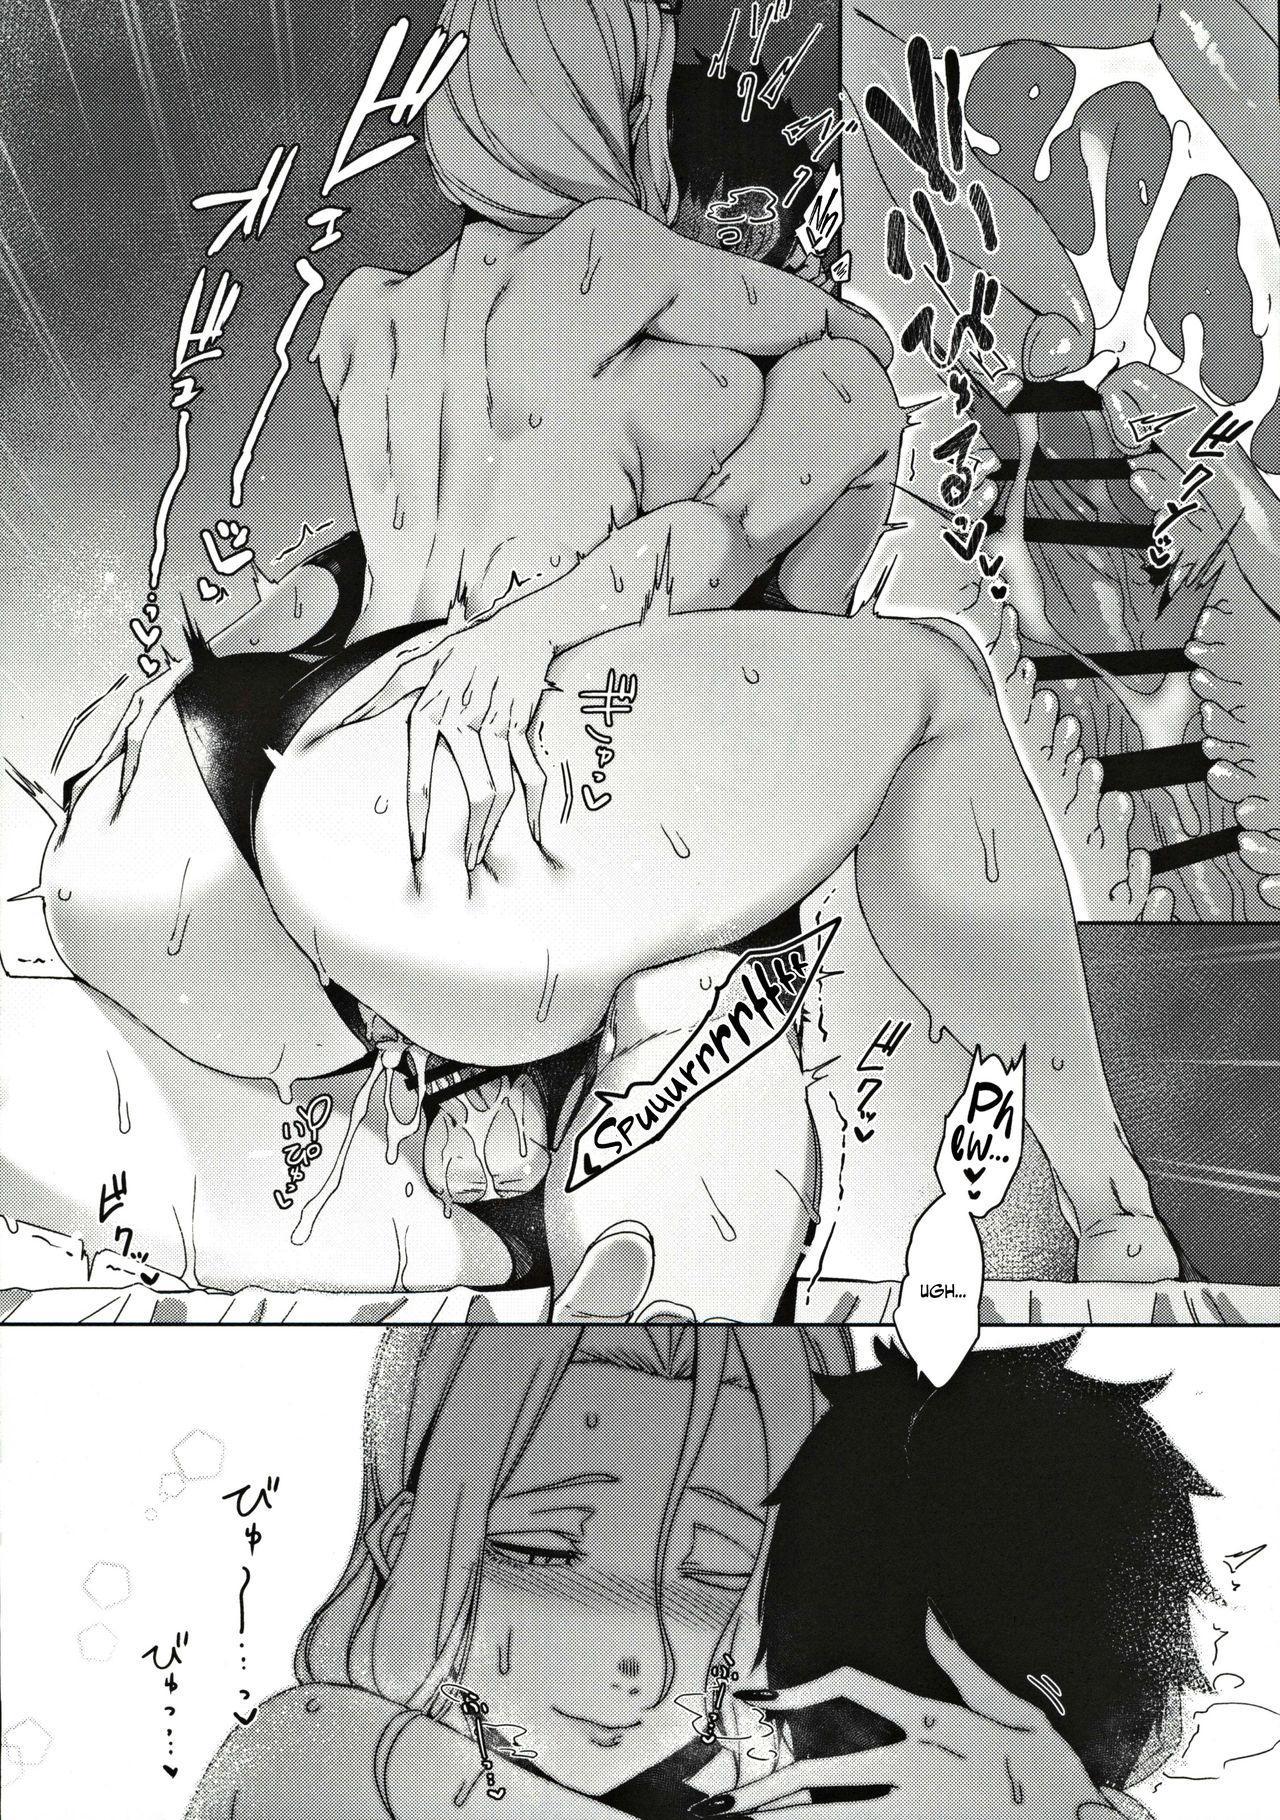 Carmilla-san no Ecchi na no ga Kakitakatta Hon | I Wanted To Draw A Book About Carmilla's Sexiness 24